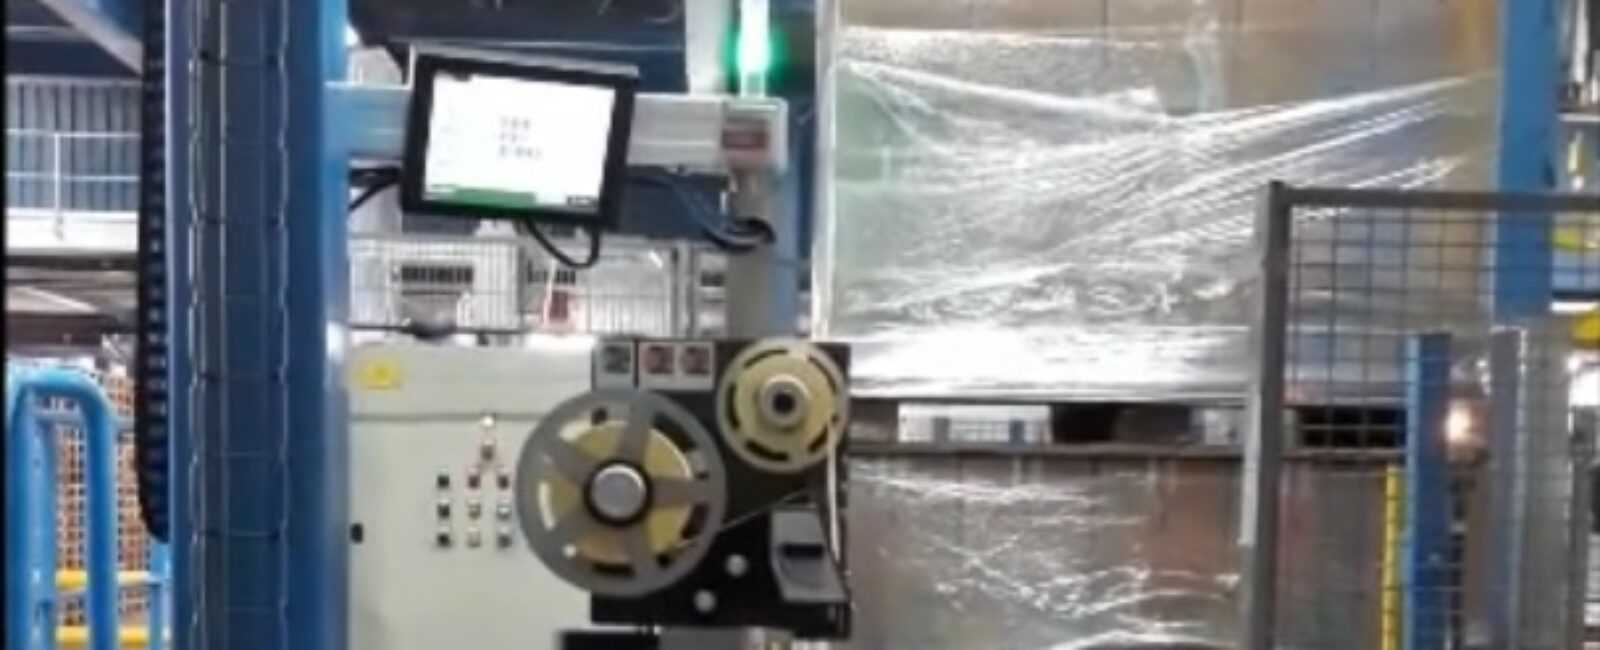 pallet labeling in papier industrie